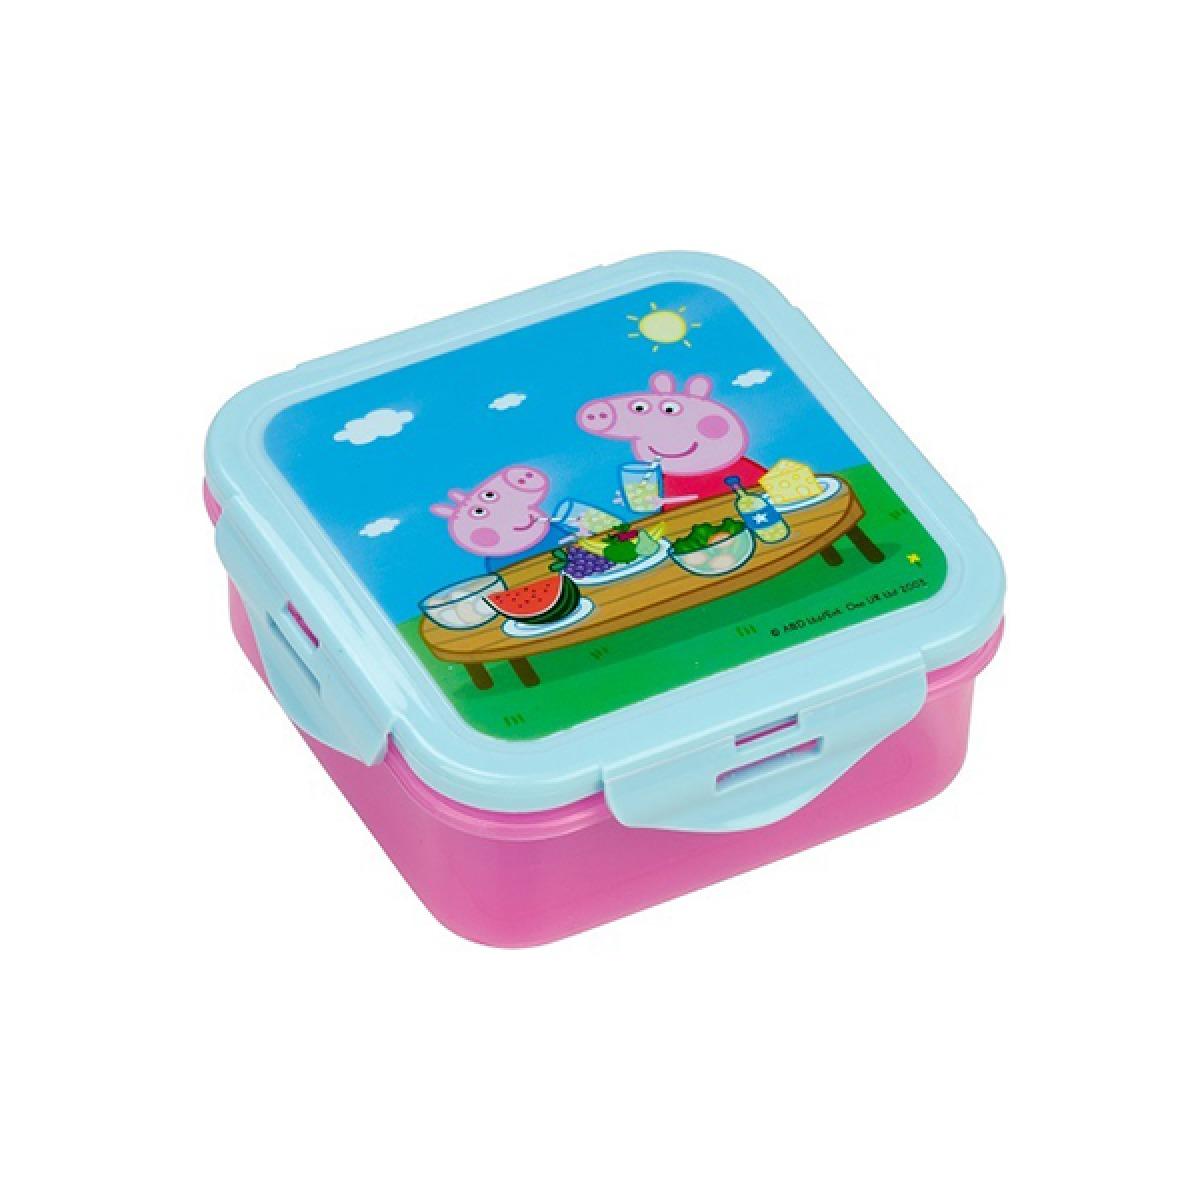 Peppa Pig Lunch box image